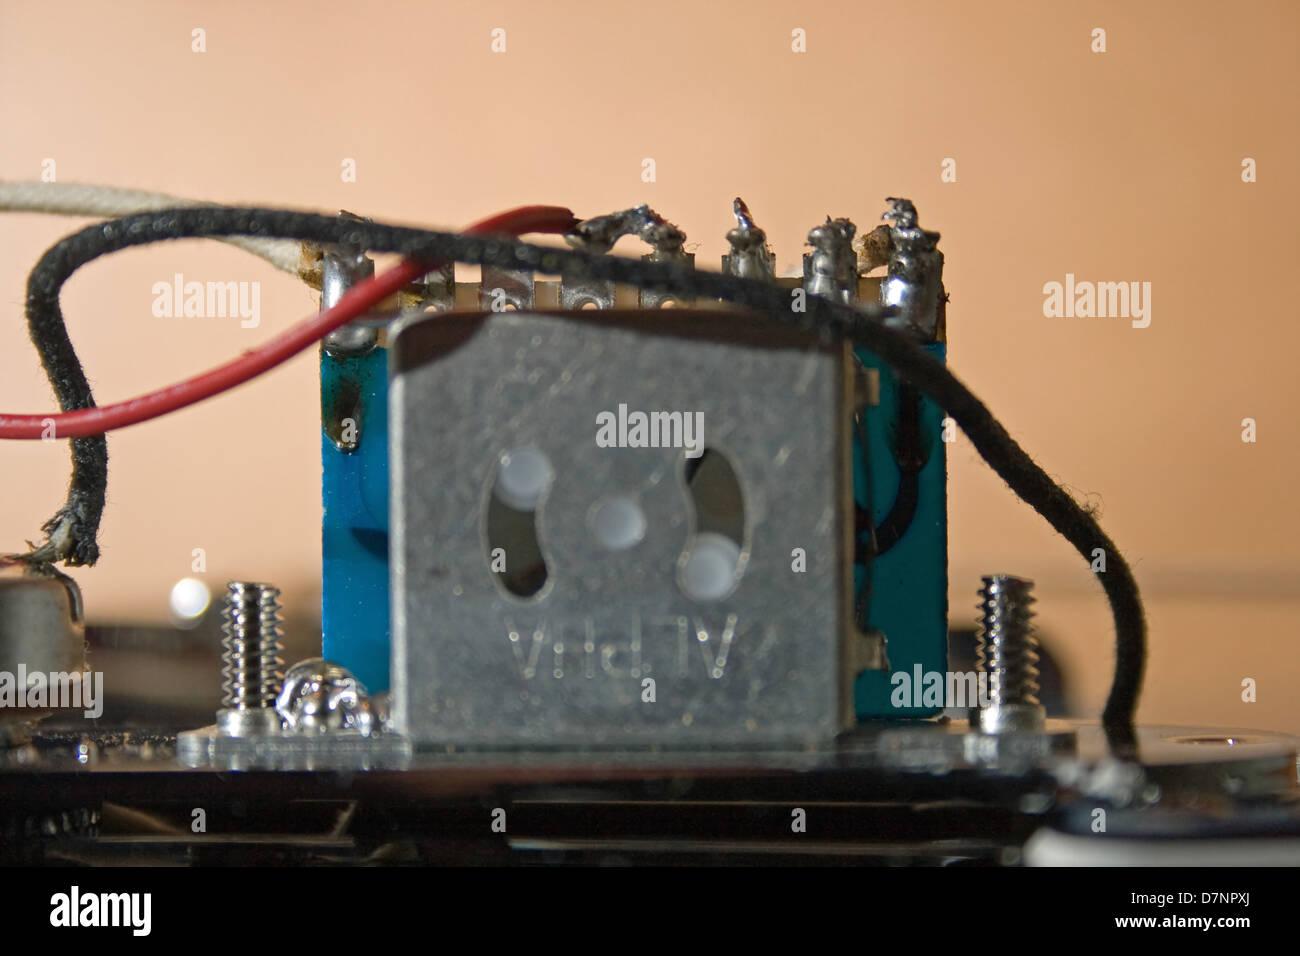 Erfreut Tele 3 Wege Schalter Fotos - Elektrische Schaltplan-Ideen ...